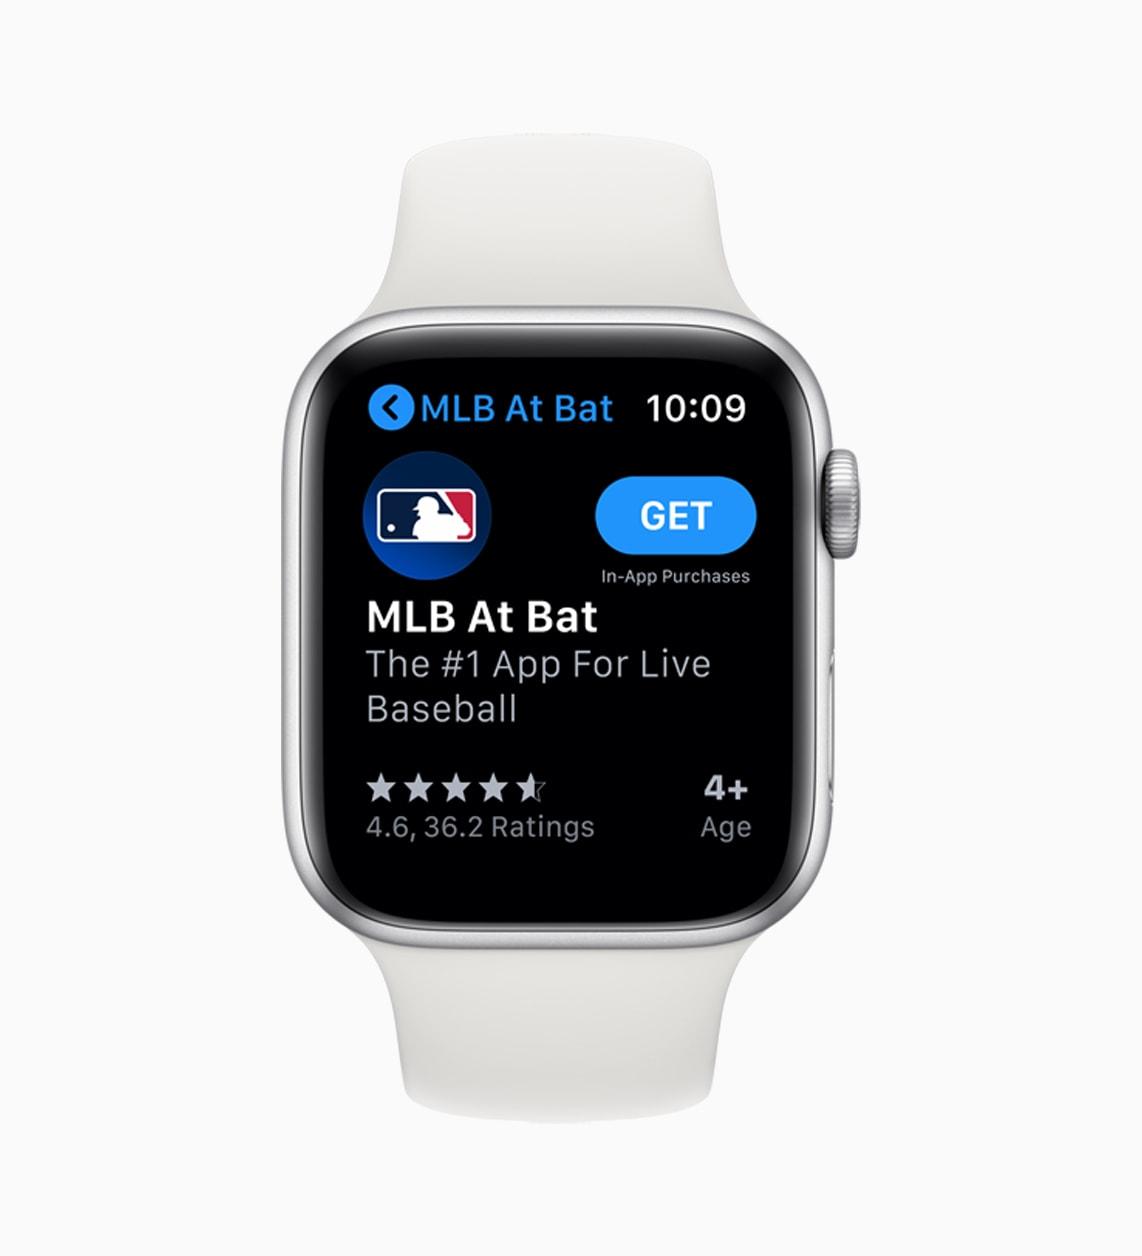 App Store on watchOS 6